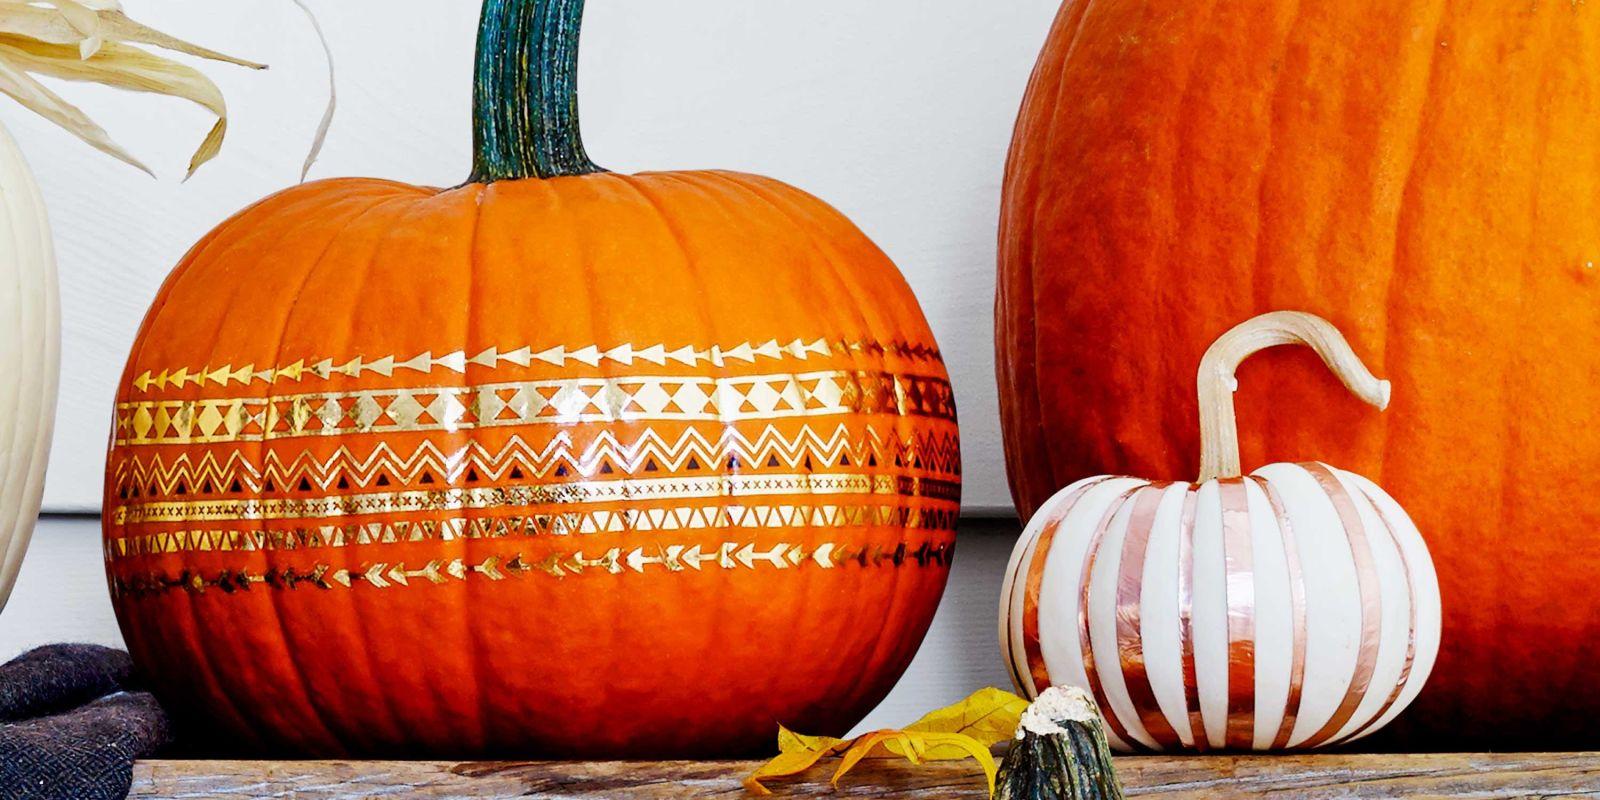 Best no carve pumpkin decorating ideas fun designs